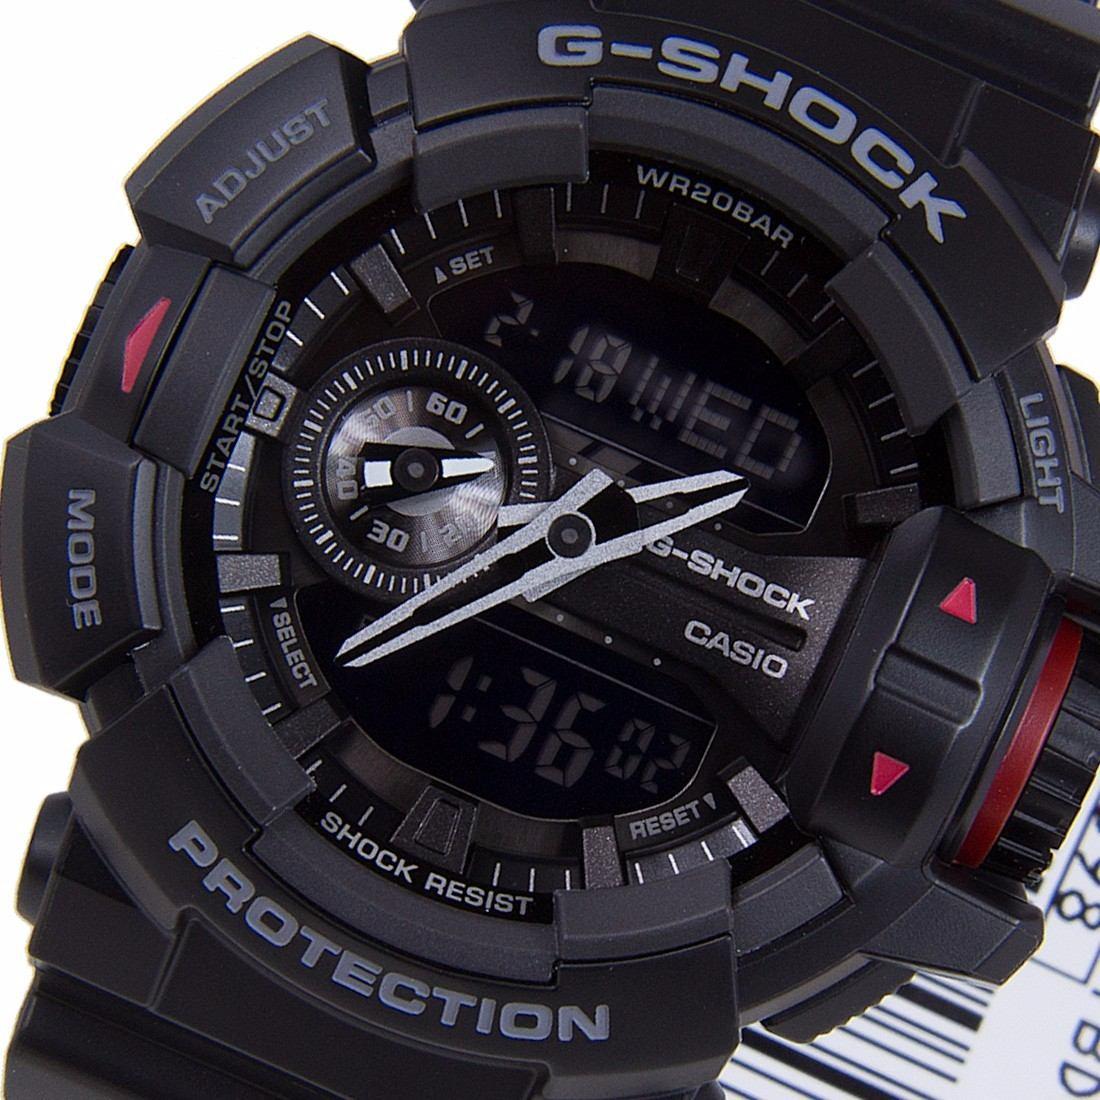 73dc3068a12 Relógio Masculino Casio G-shock Ga-400-1b Original Ga400 - R  564